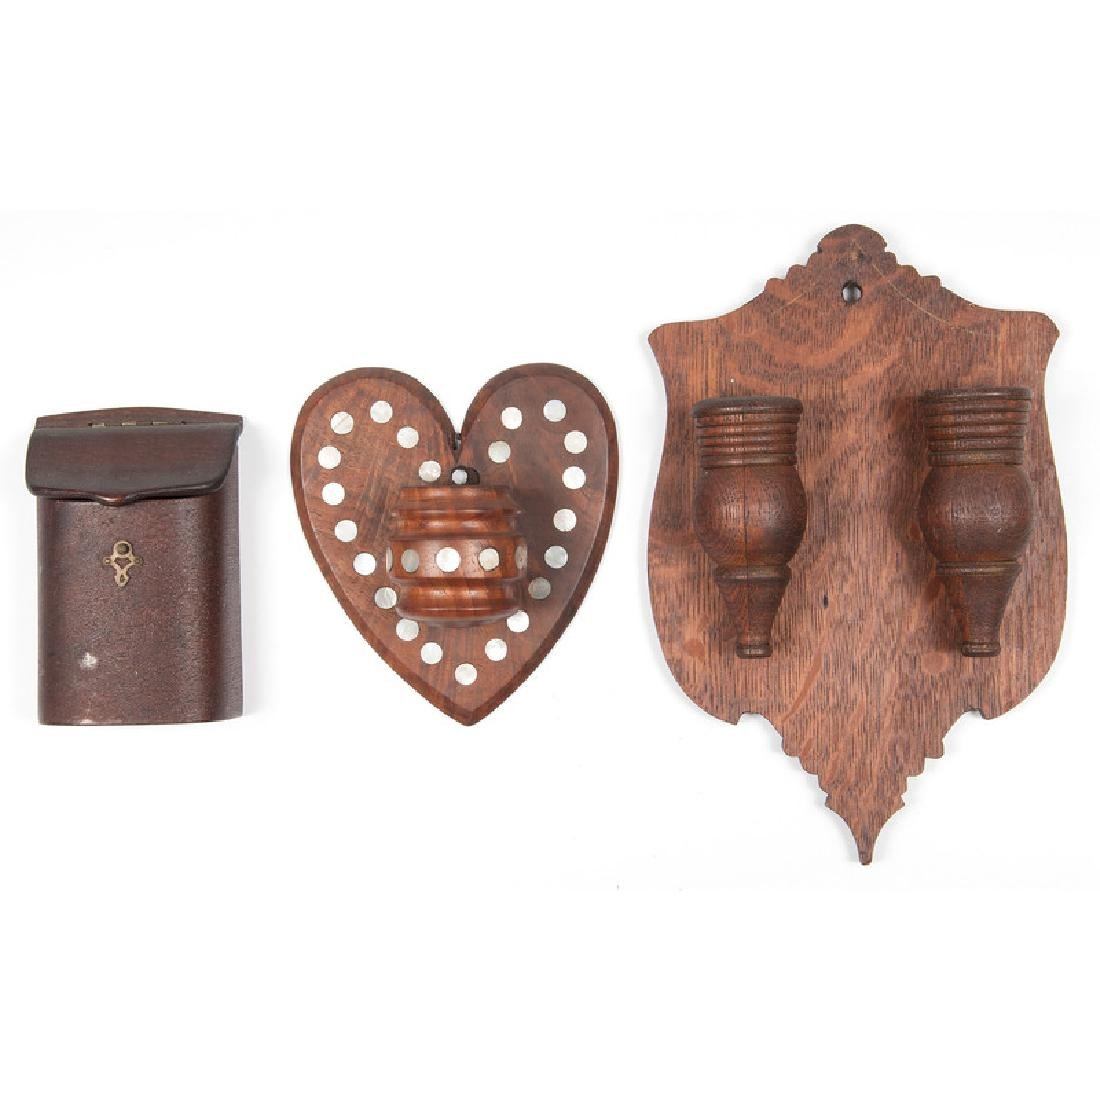 Three Wooden Match Holders